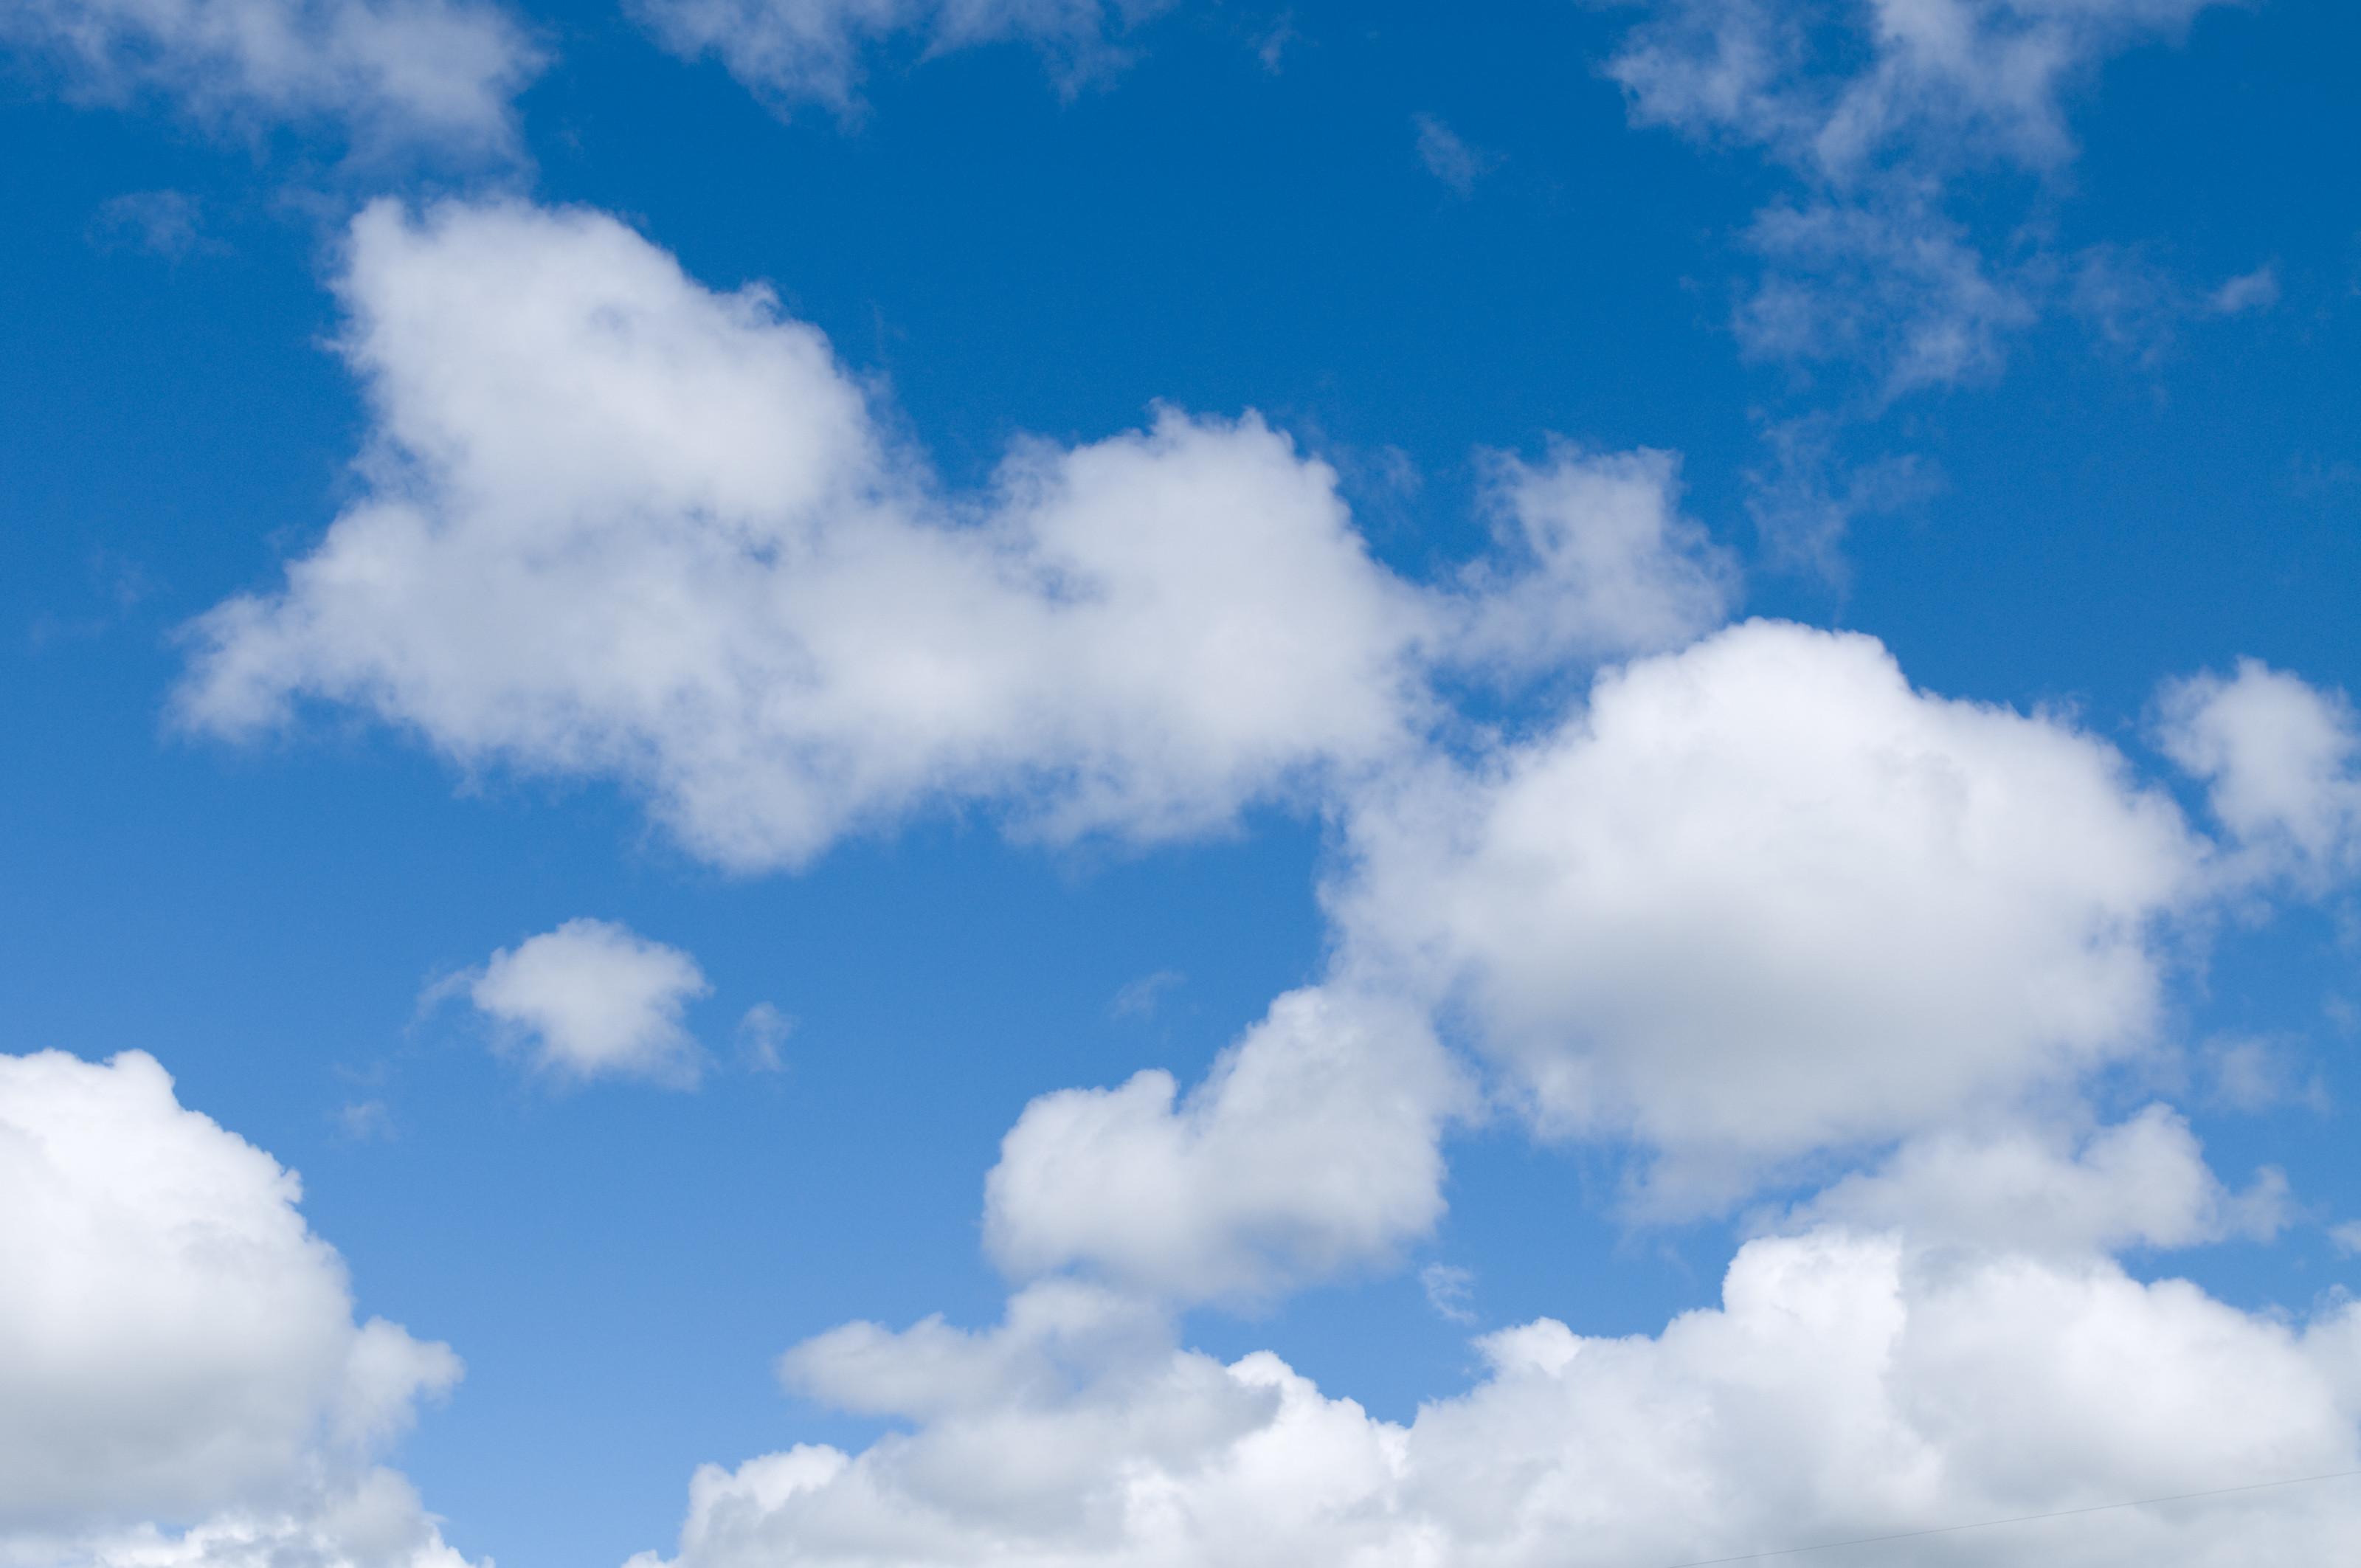 Cloud Blue Sky Clouds Background